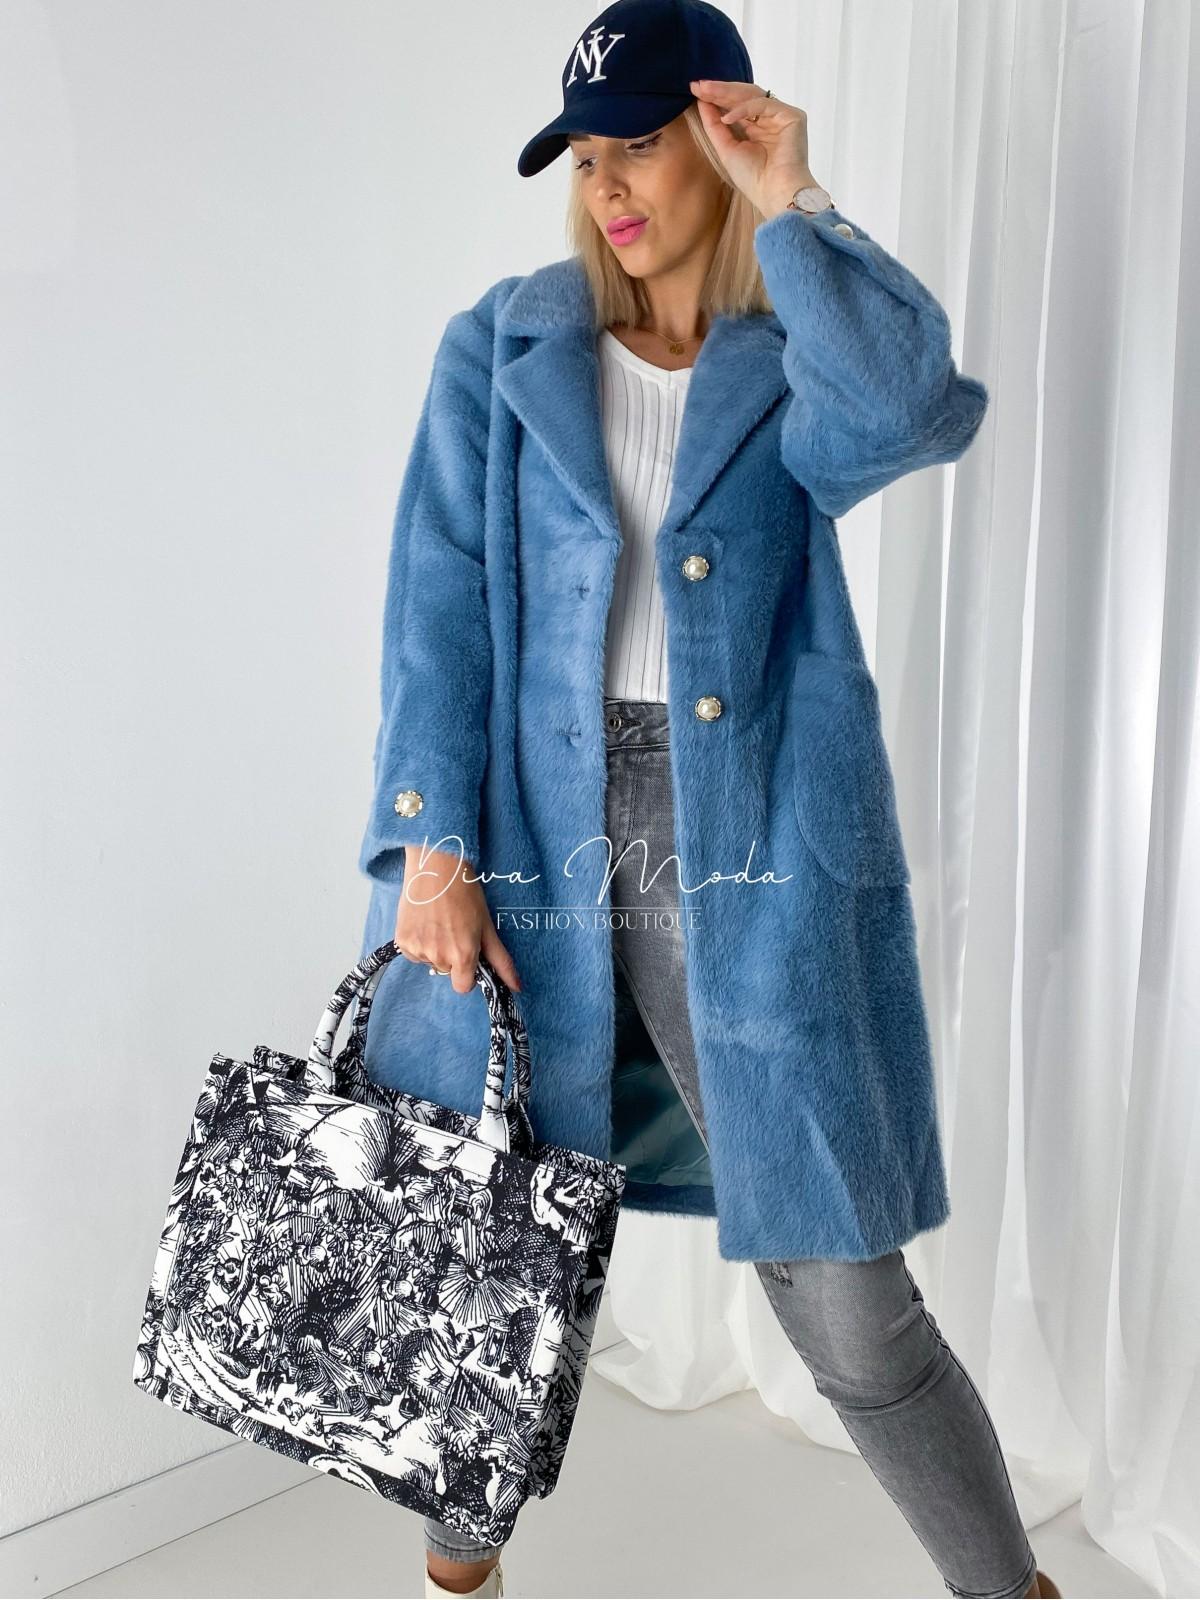 Chlpatý kabátik Perla modrý A 75